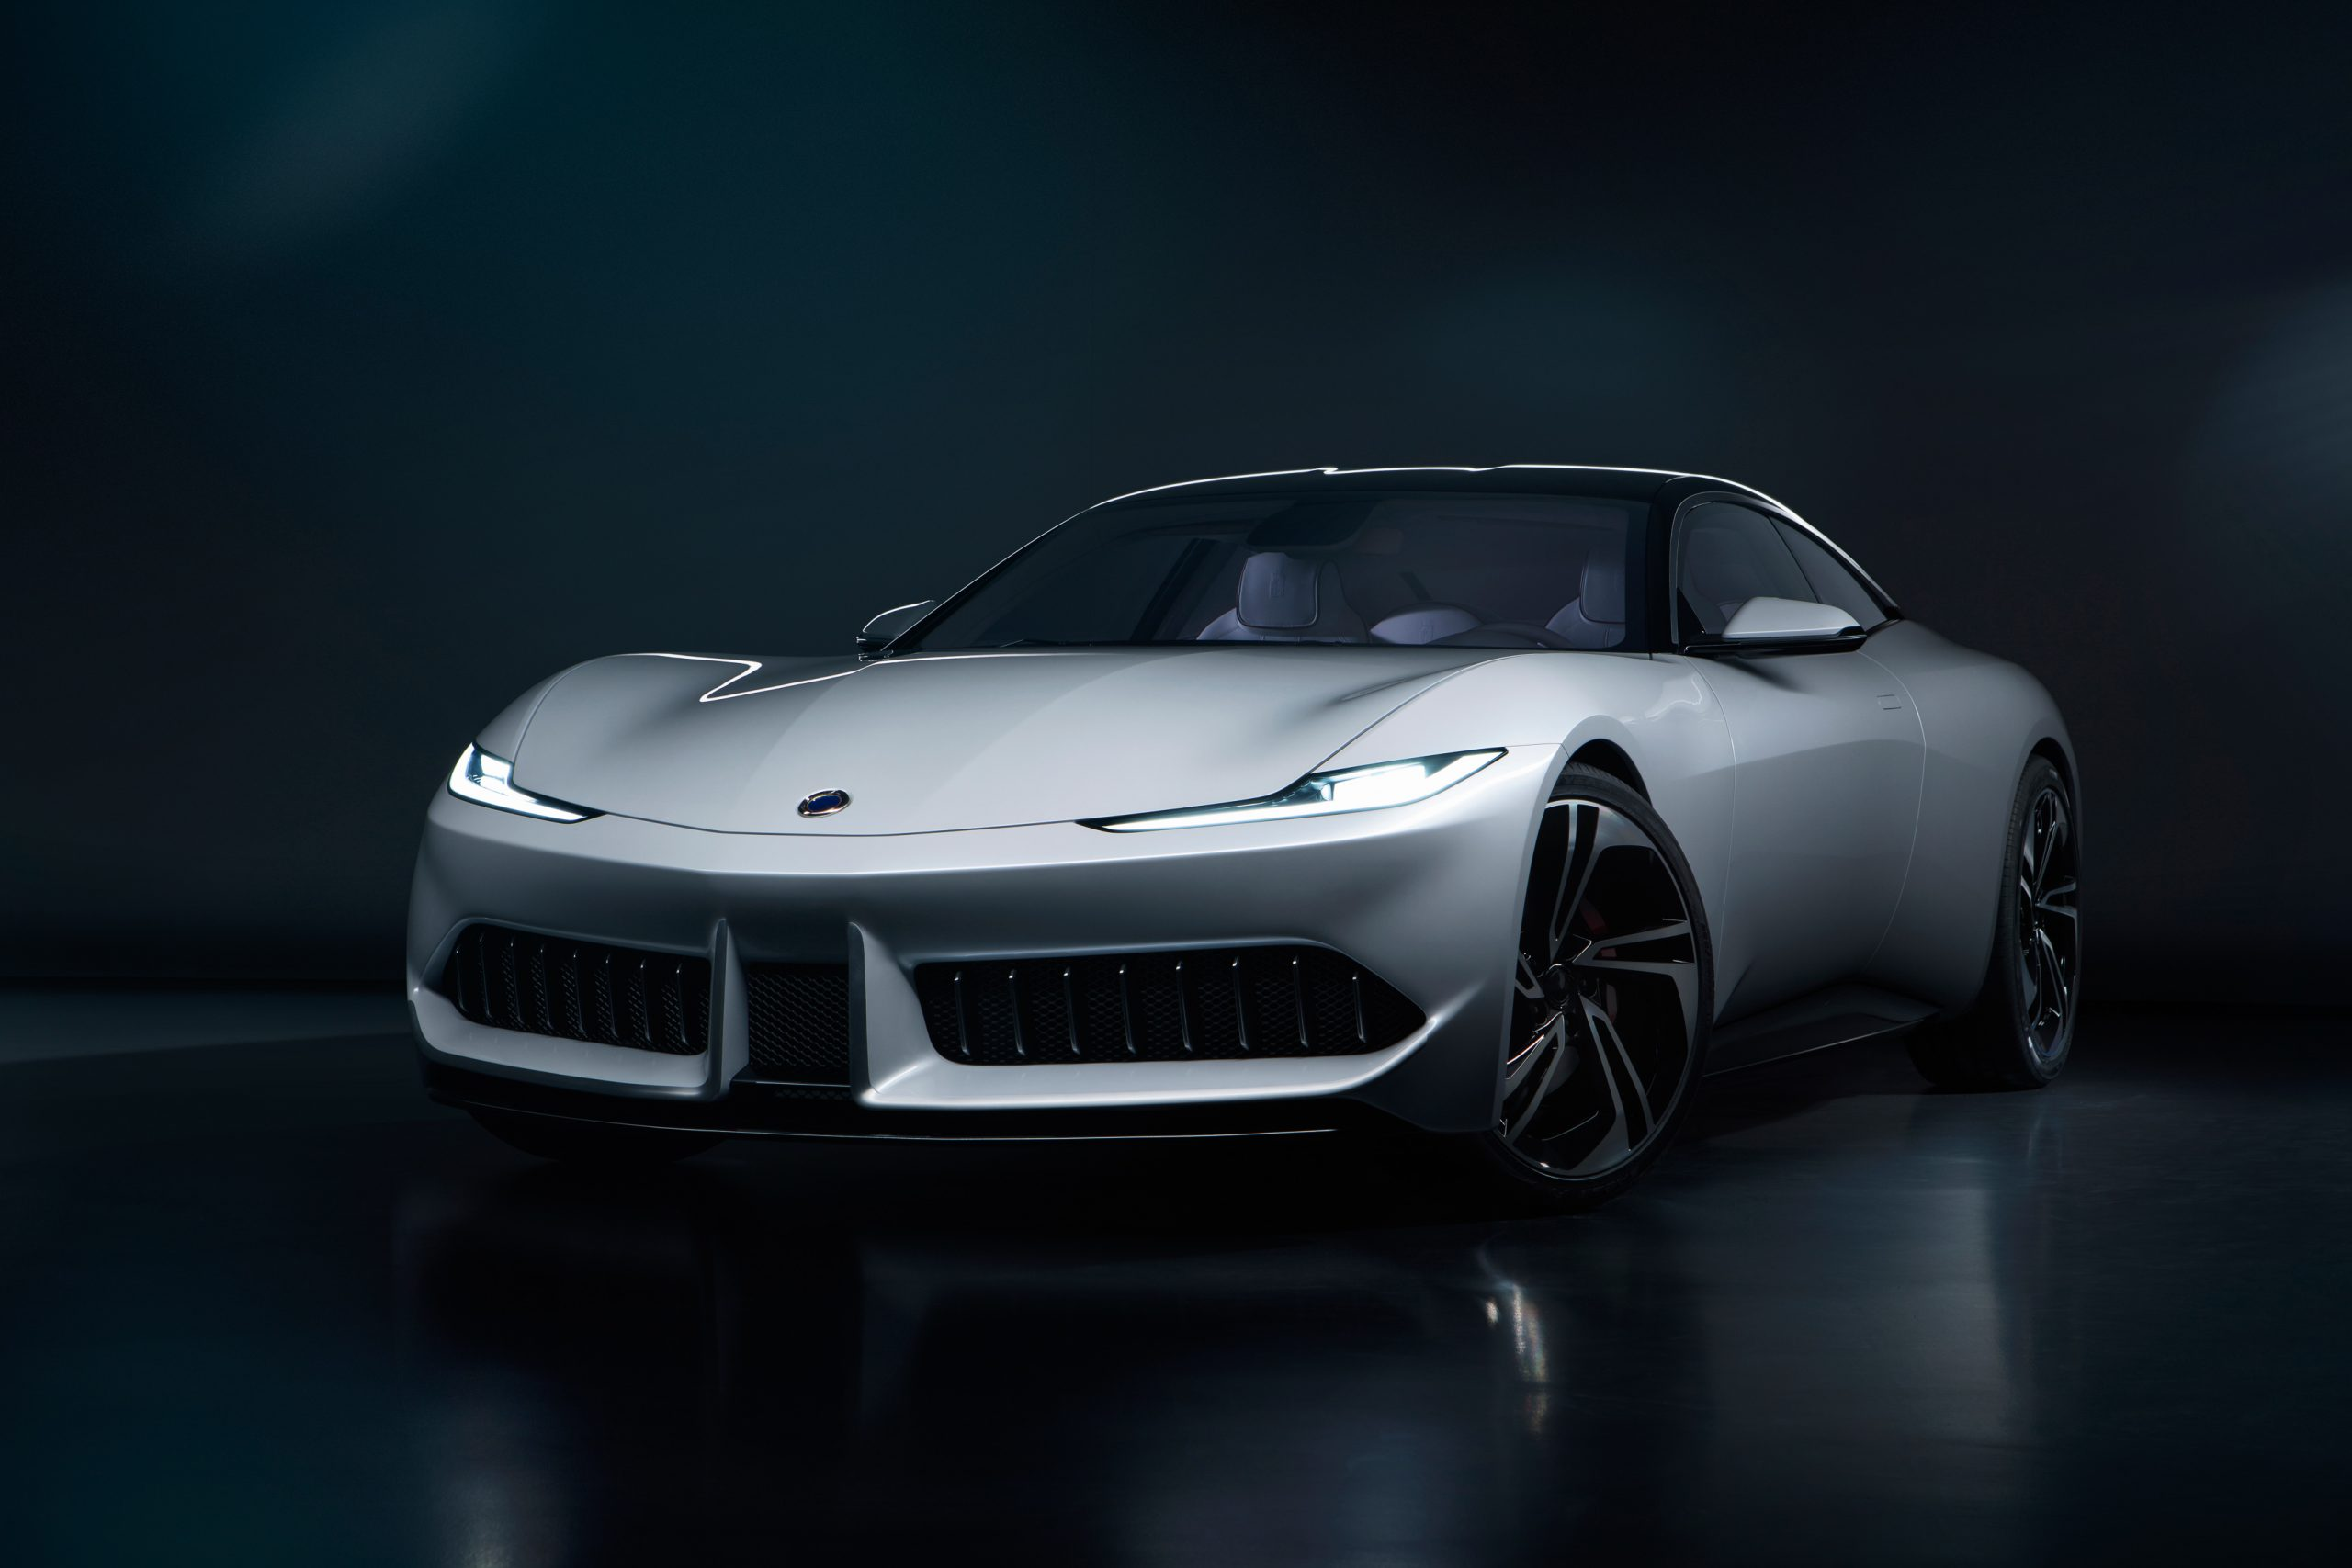 2019 Karma GT by Pininfarina